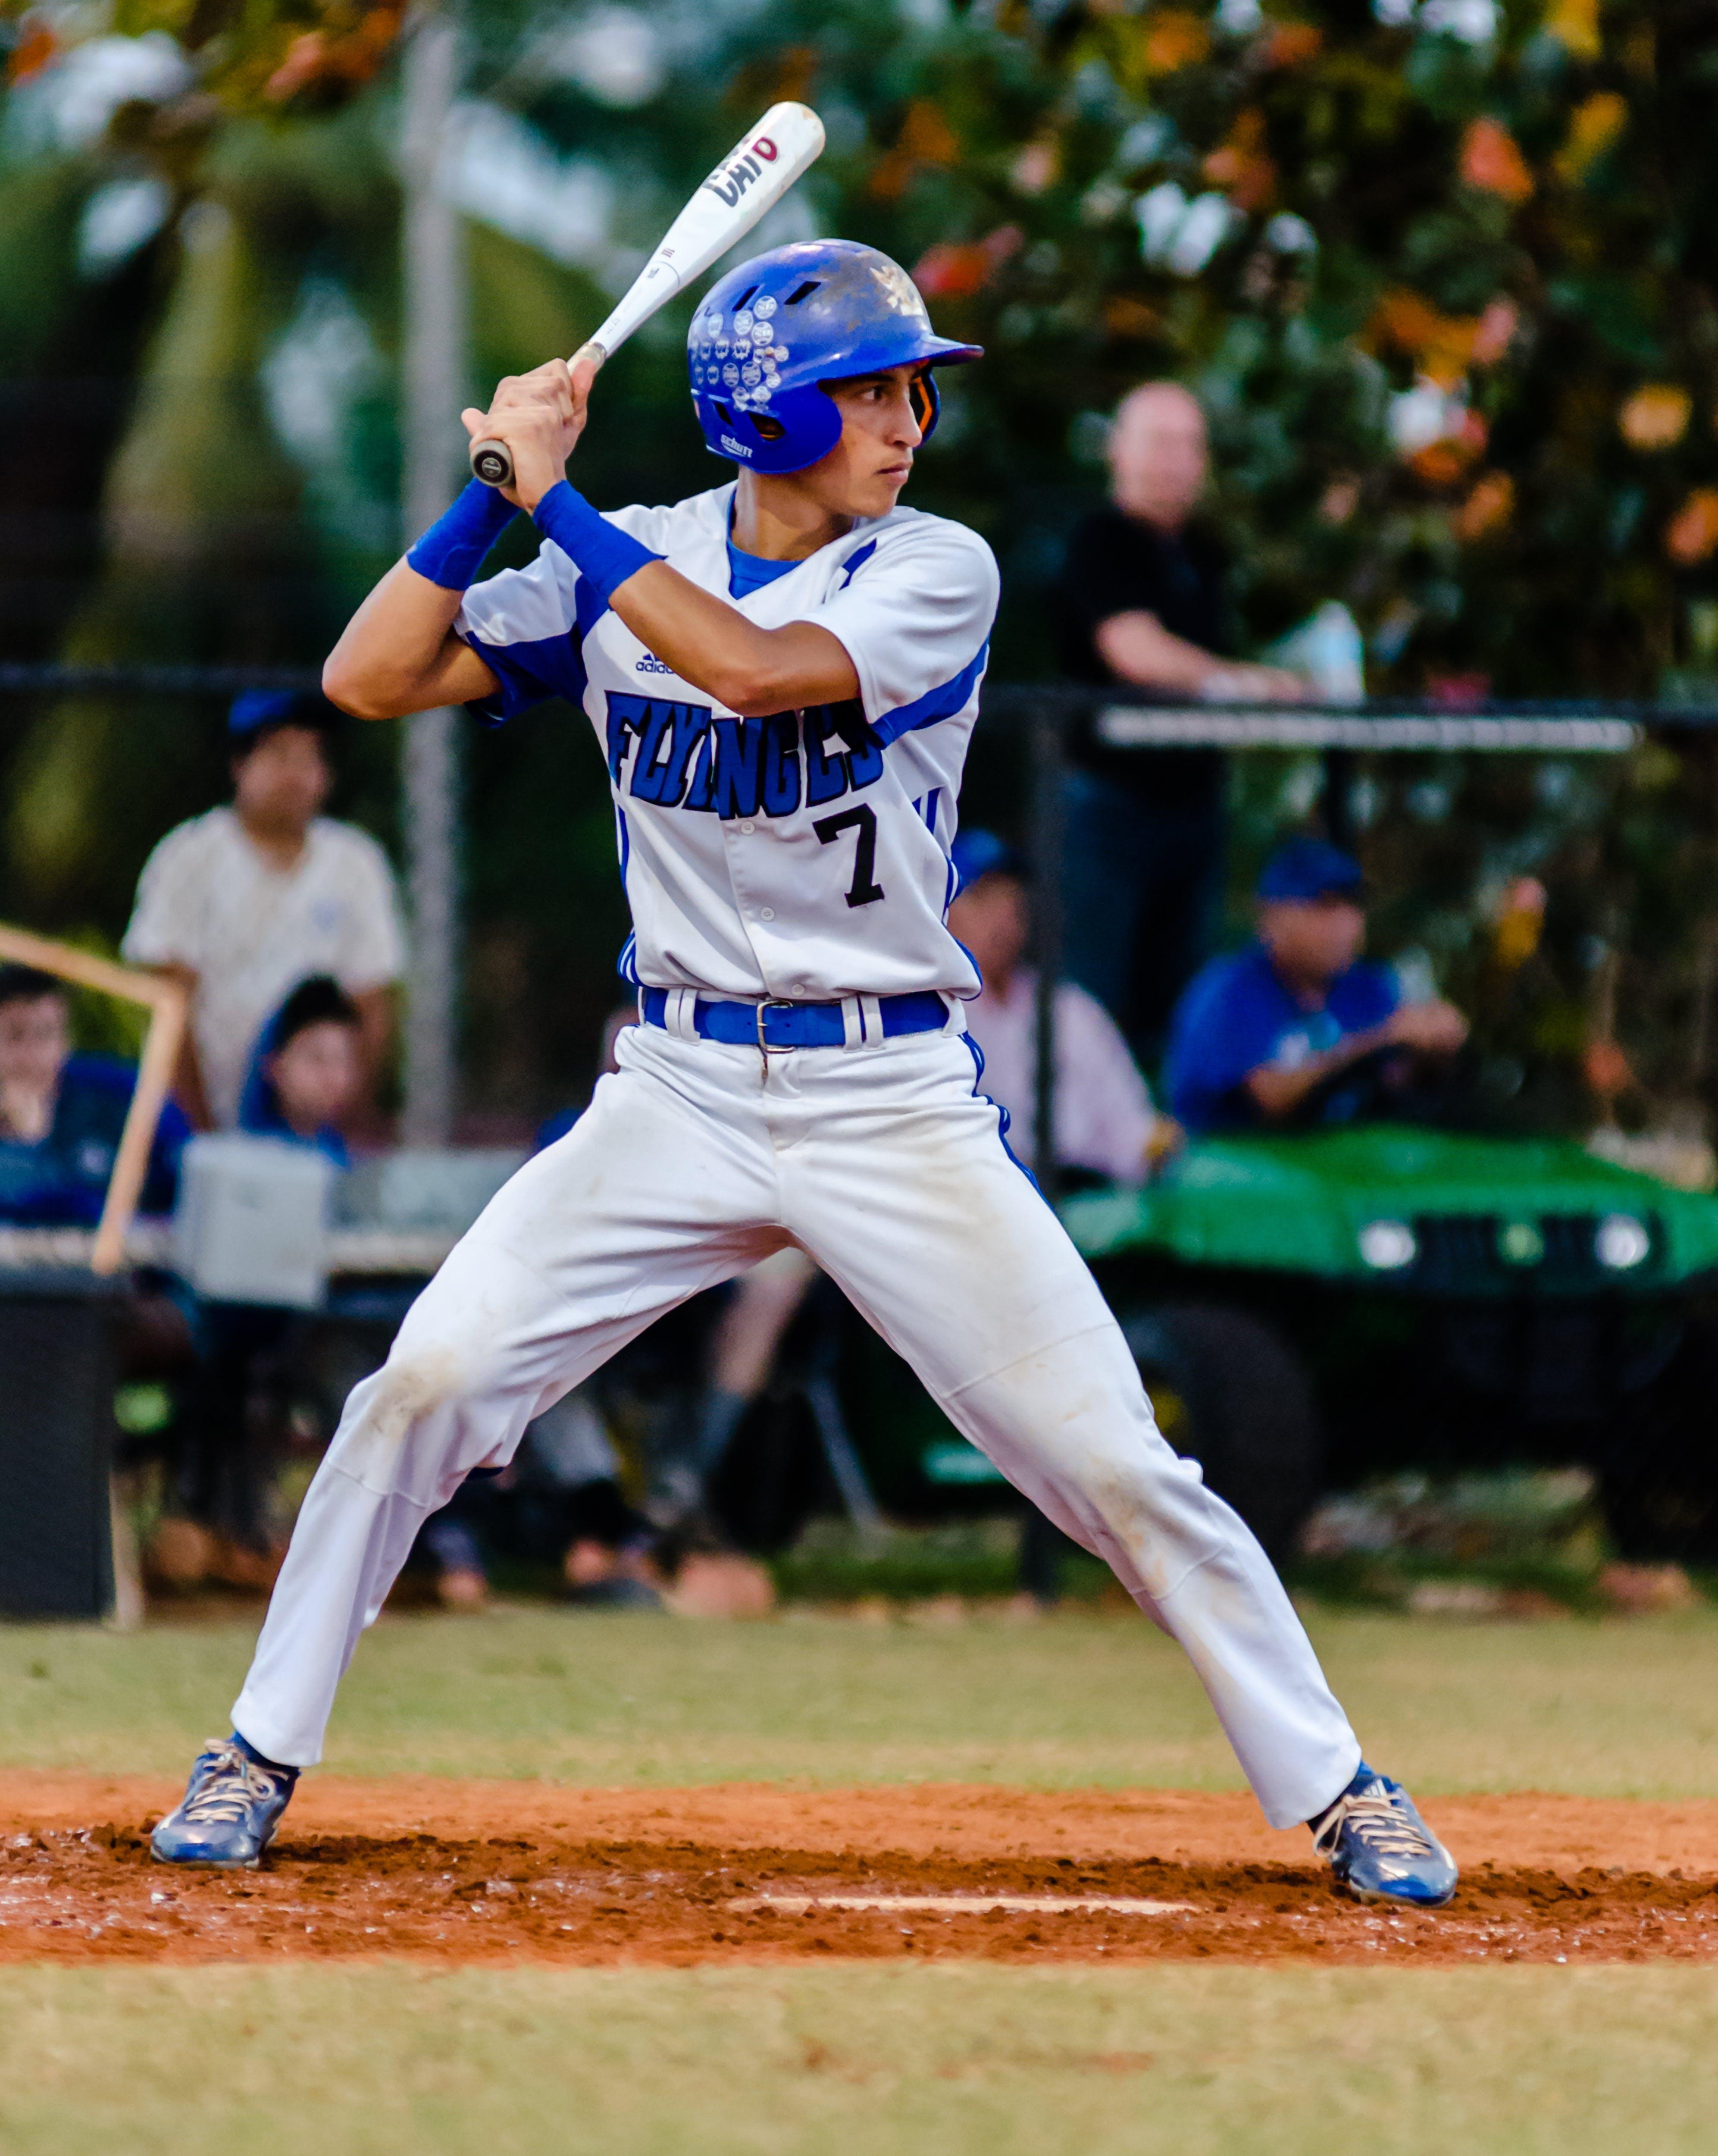 Person Holding Baseball Bat